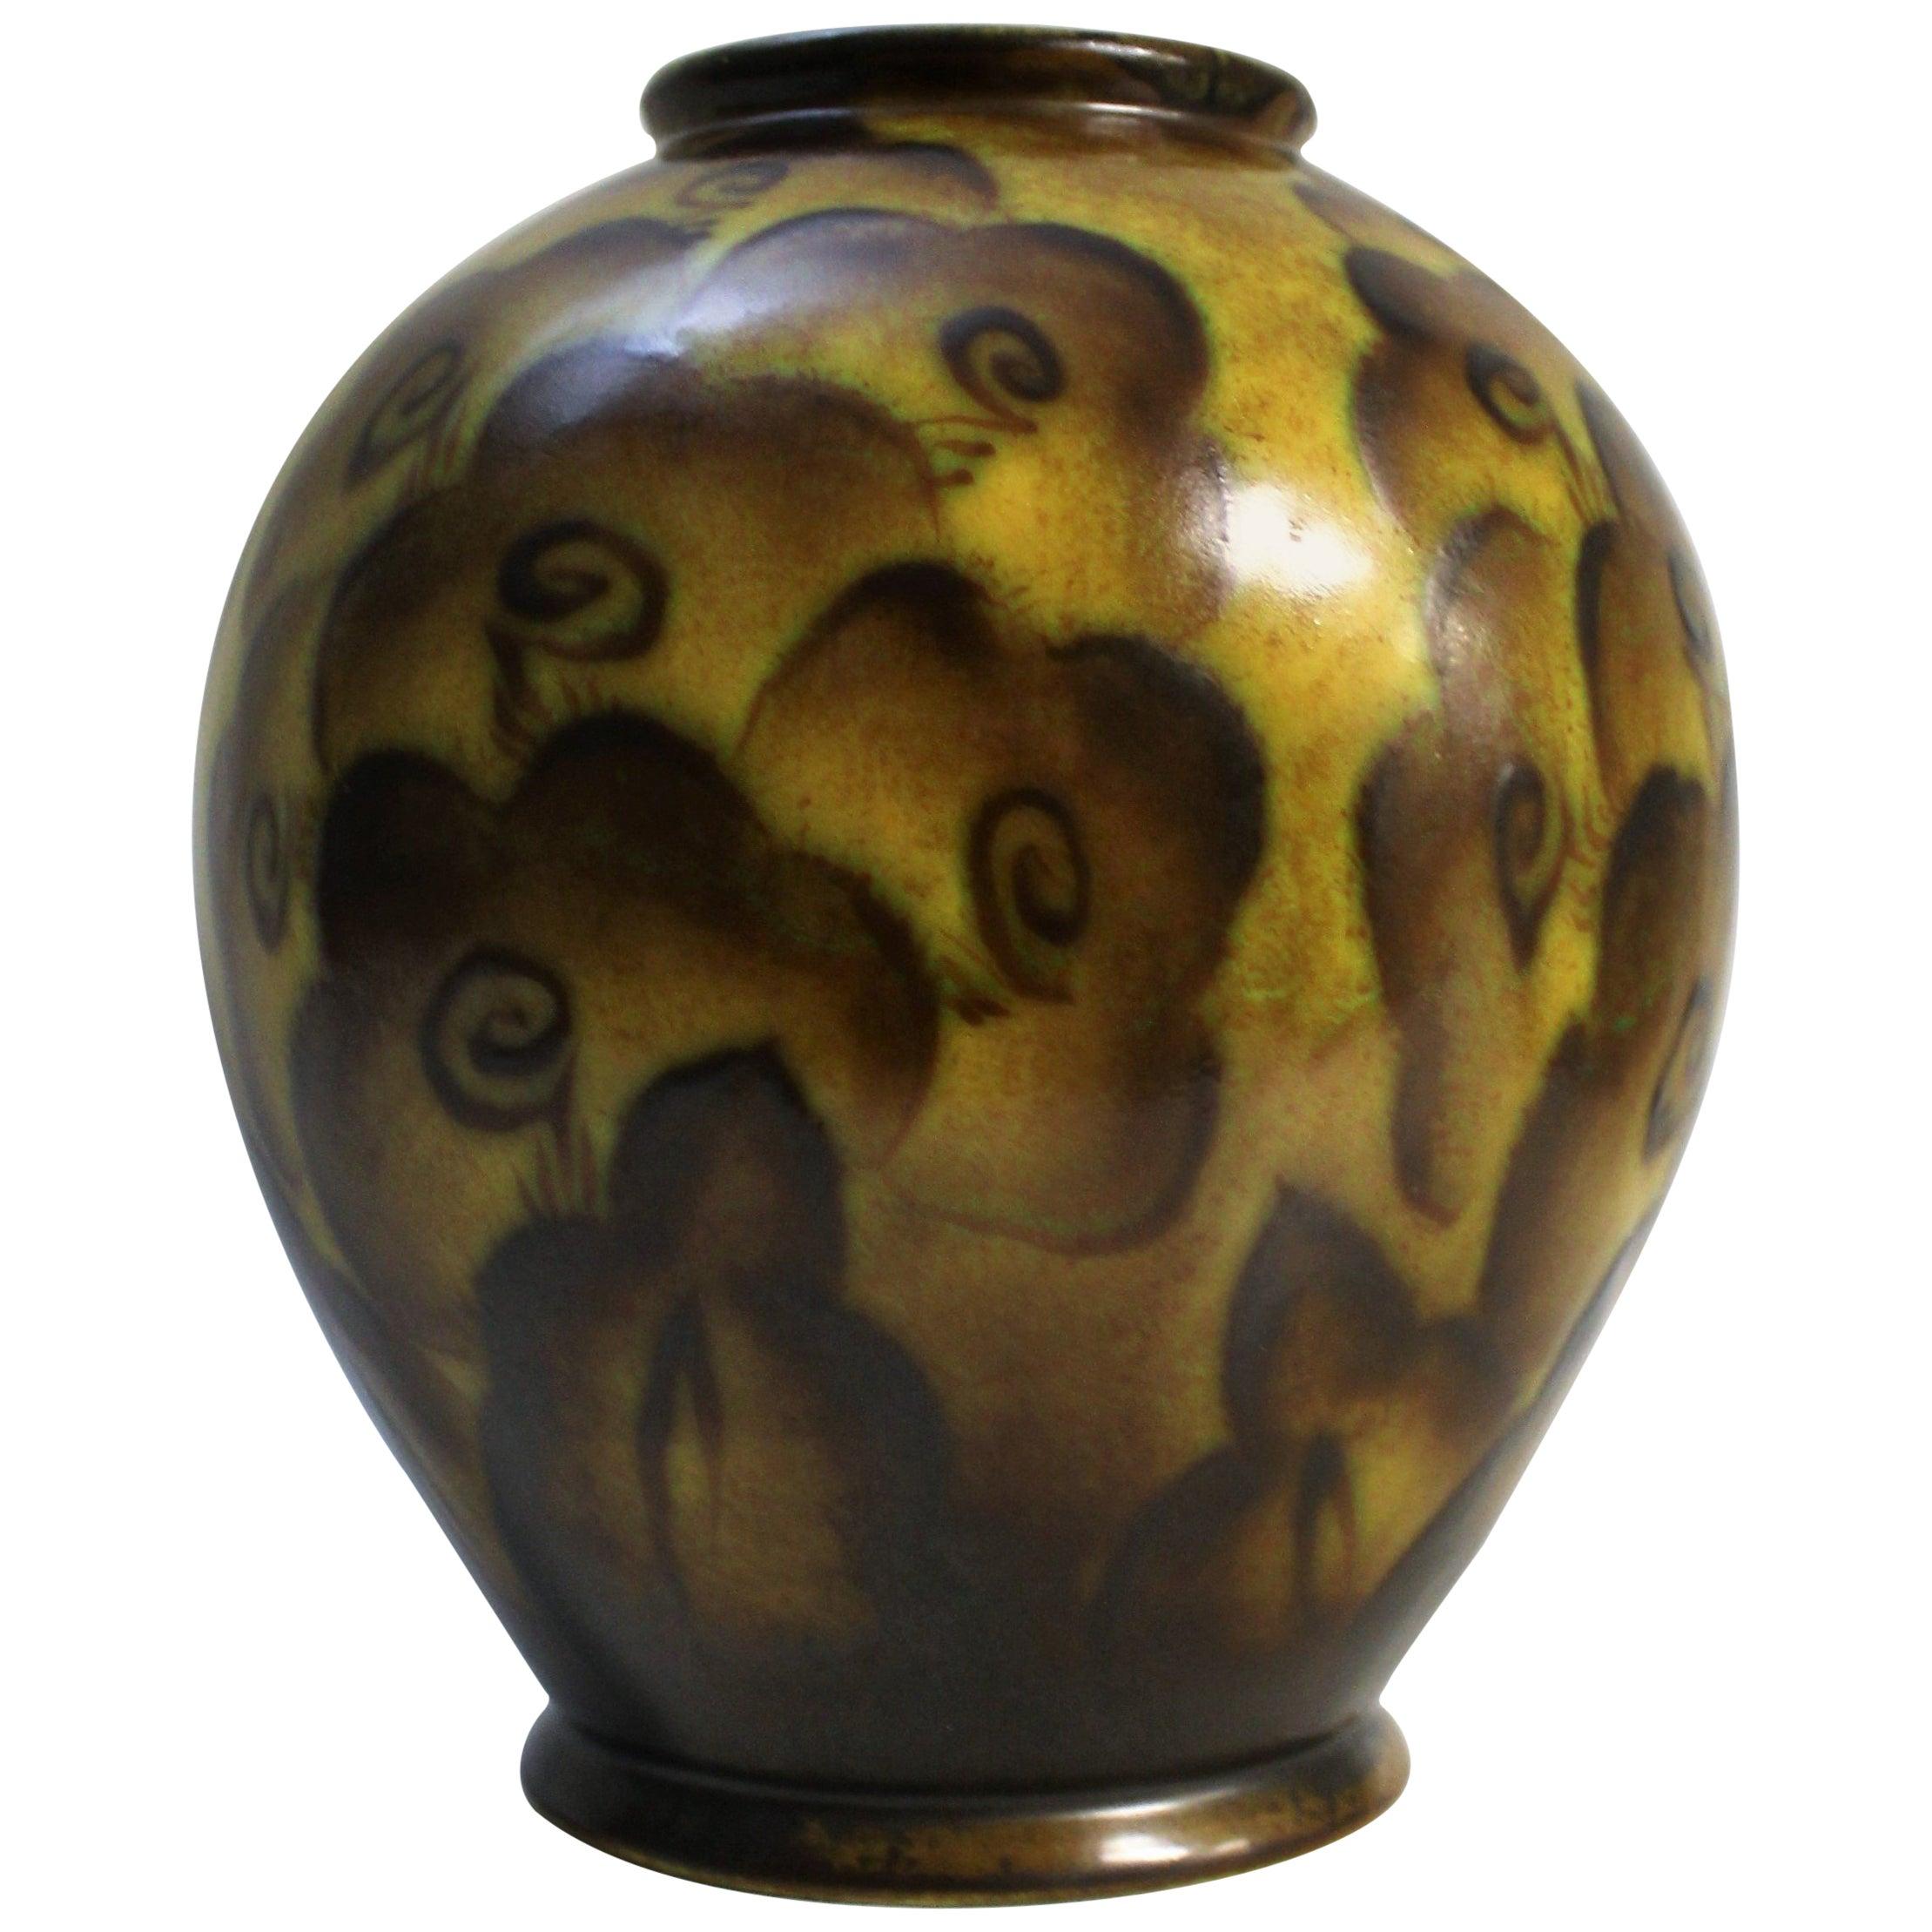 Charles Catteau for Boch Freres Keramis Art Deco Vase